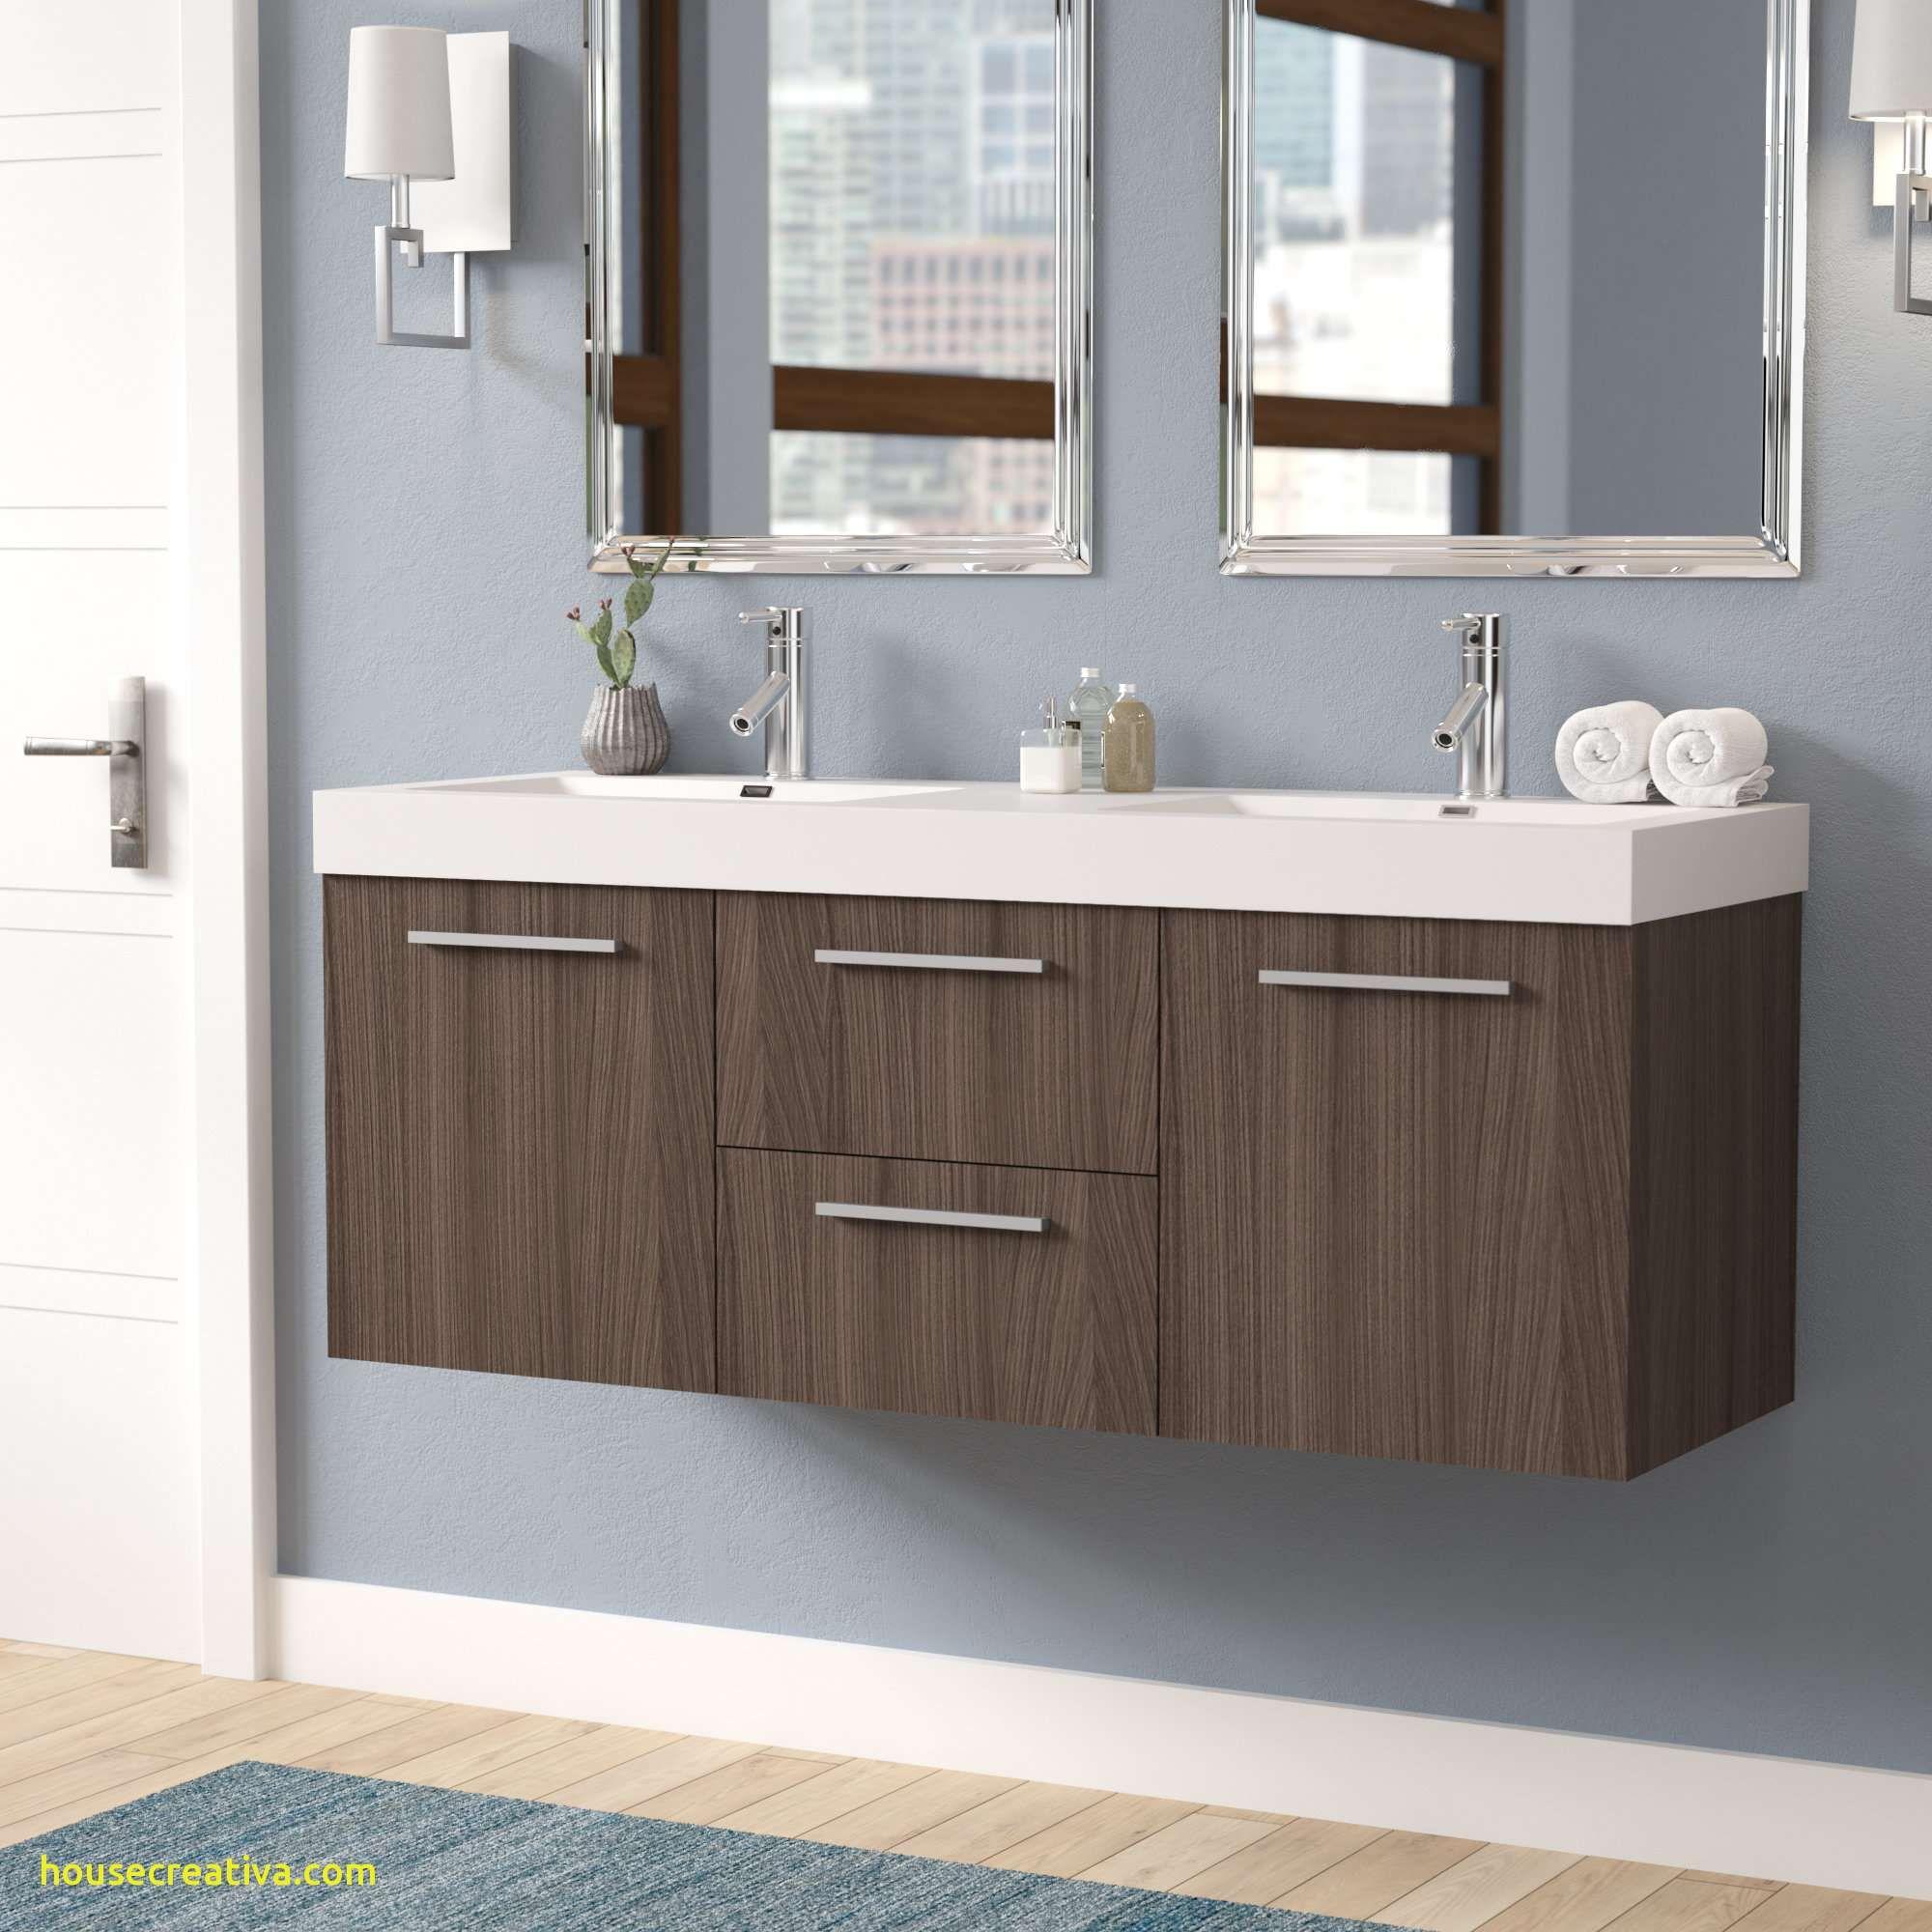 Unique 59 Double Sink Bathroom Vanity Homedecoration